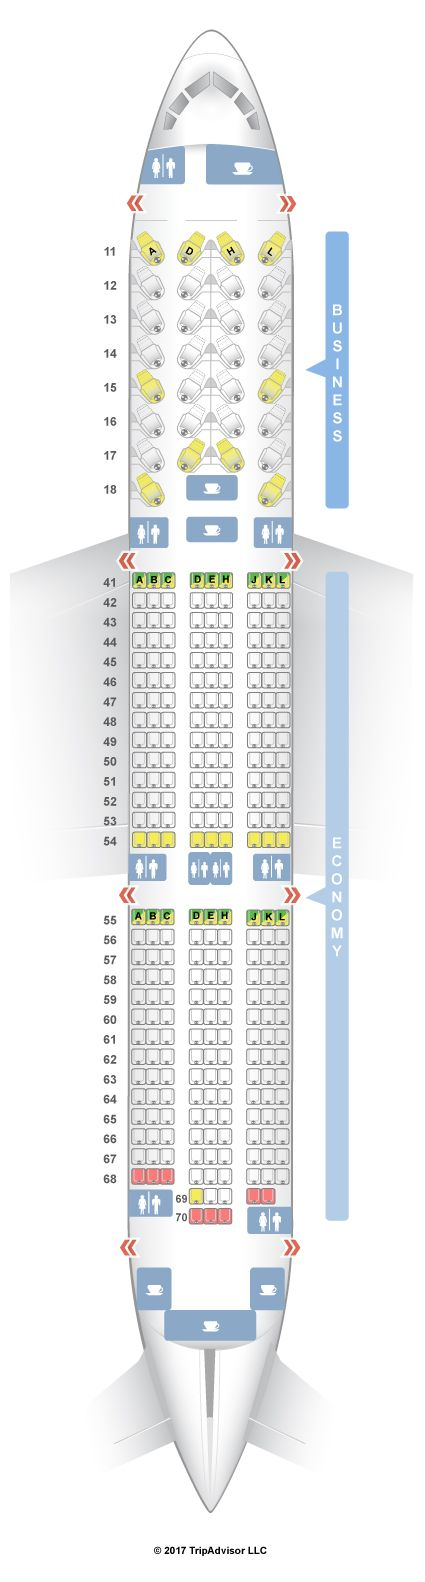 Air Canada 789 Seat Map Air Canada 787 9 Seat Map   Maping Resources